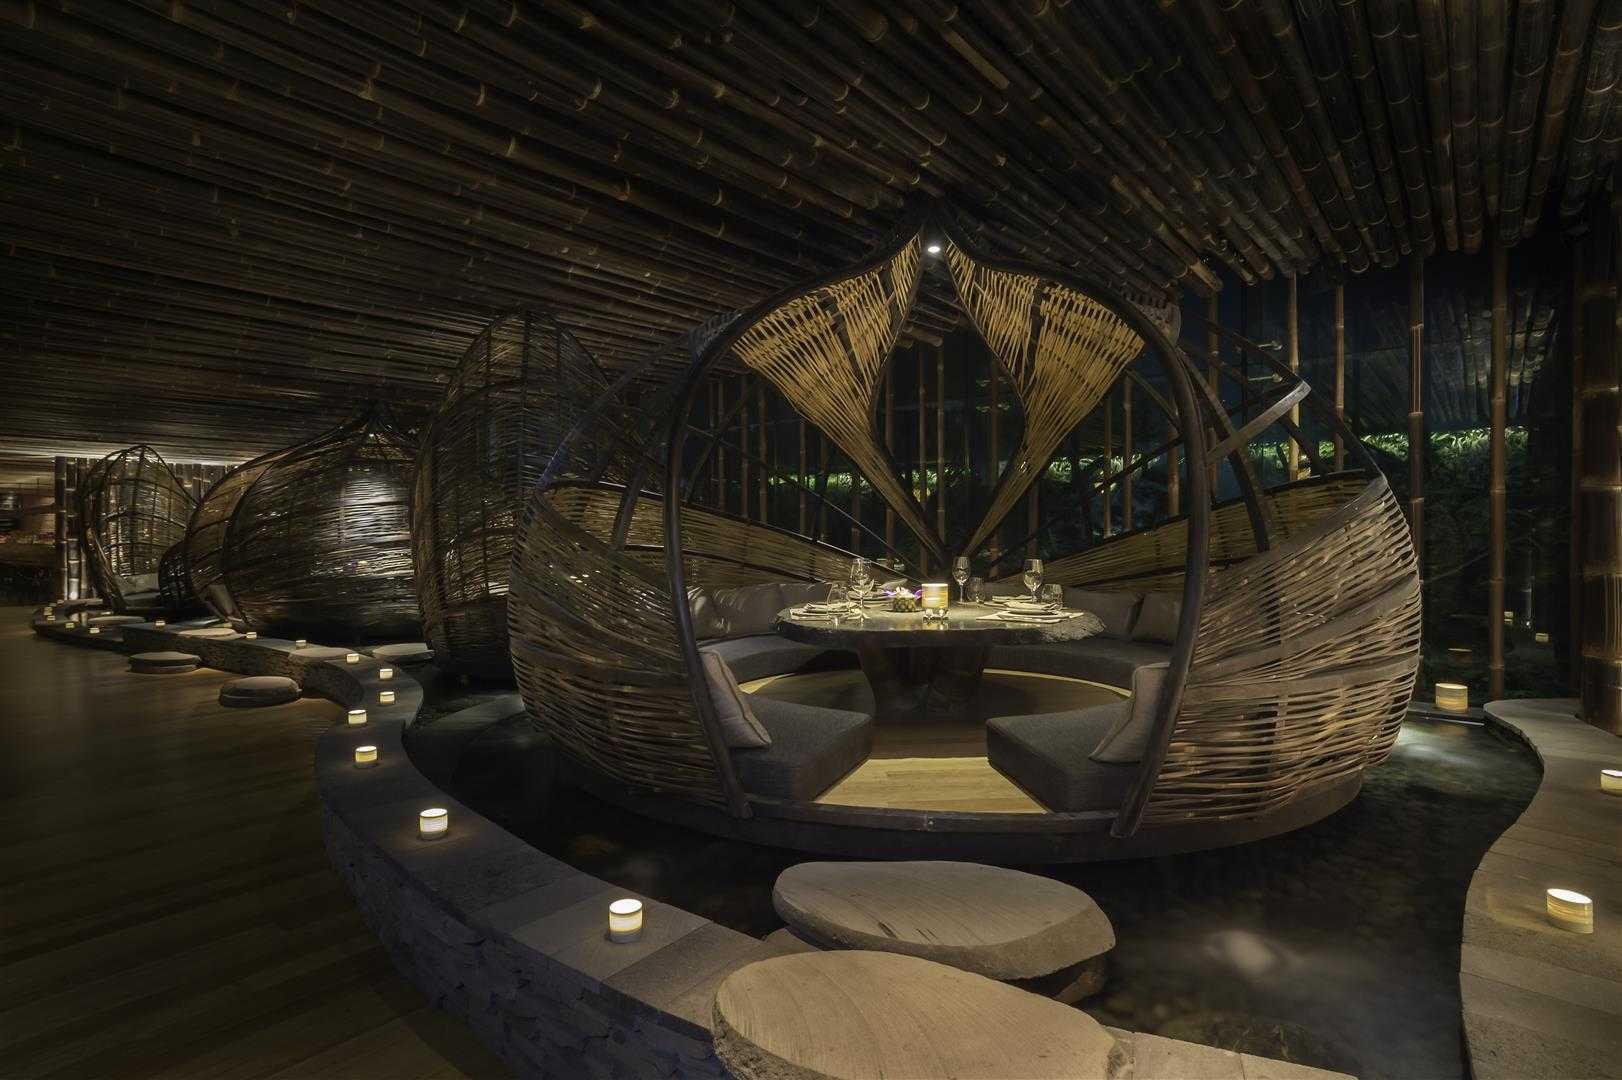 Ruang makan unik dari anyaman bambu di atas kolam (Sumber: arsitag.com)